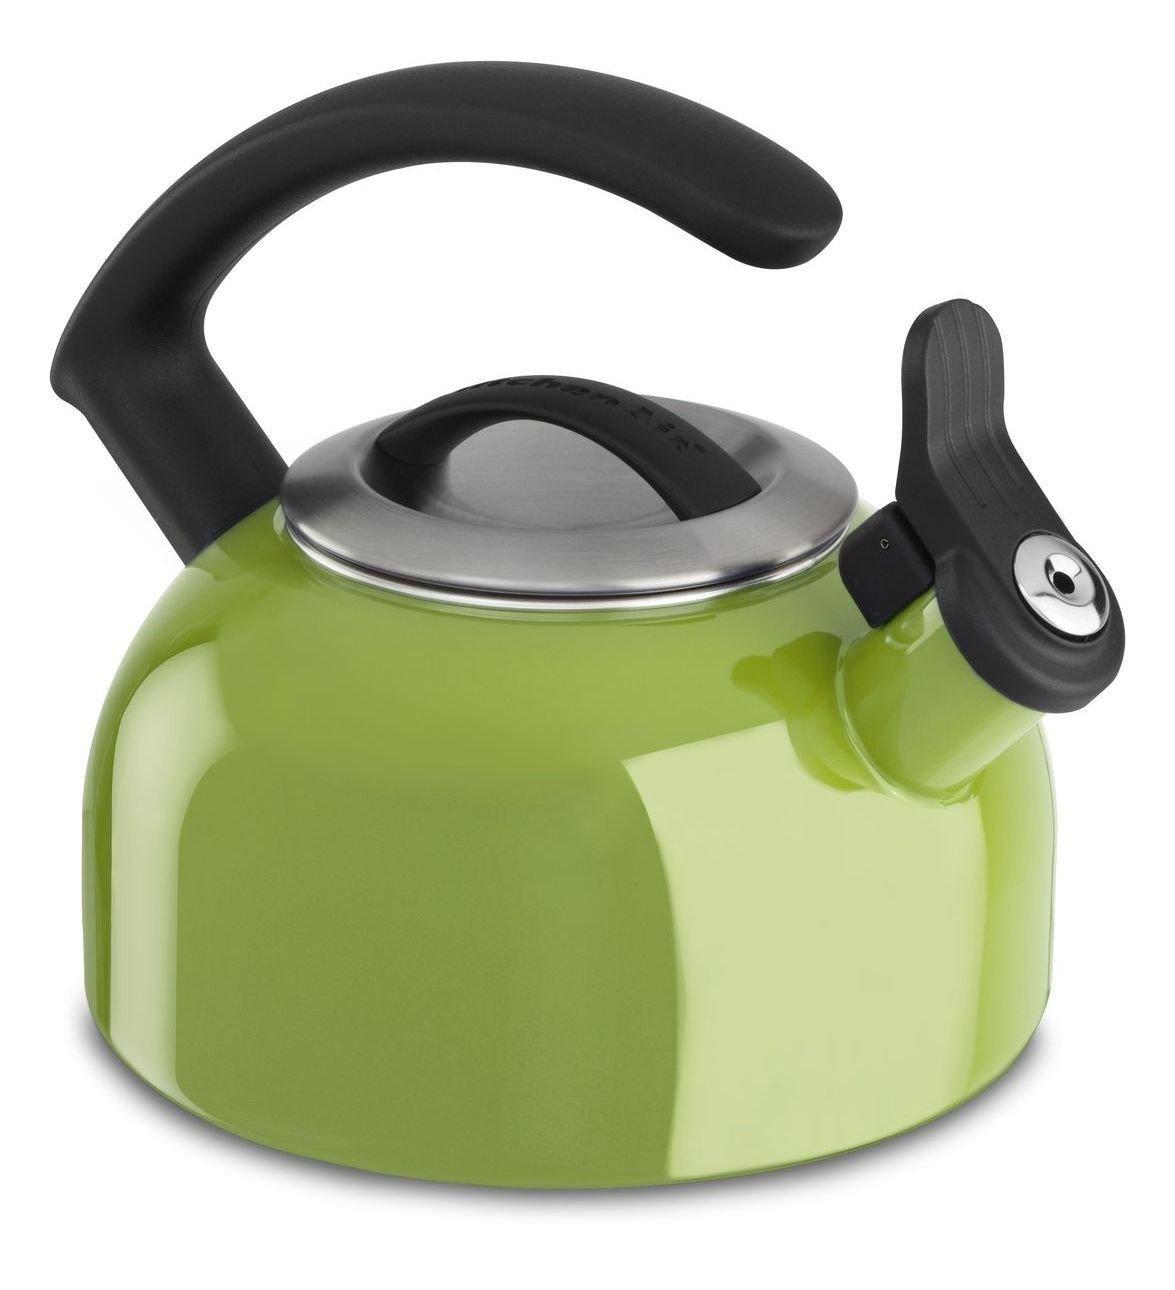 Kitchenaid 1.5-quart Remv Lid Tea Kettle Whistle Kten15ankl Sunkissed Lime Green Gift for Your Family